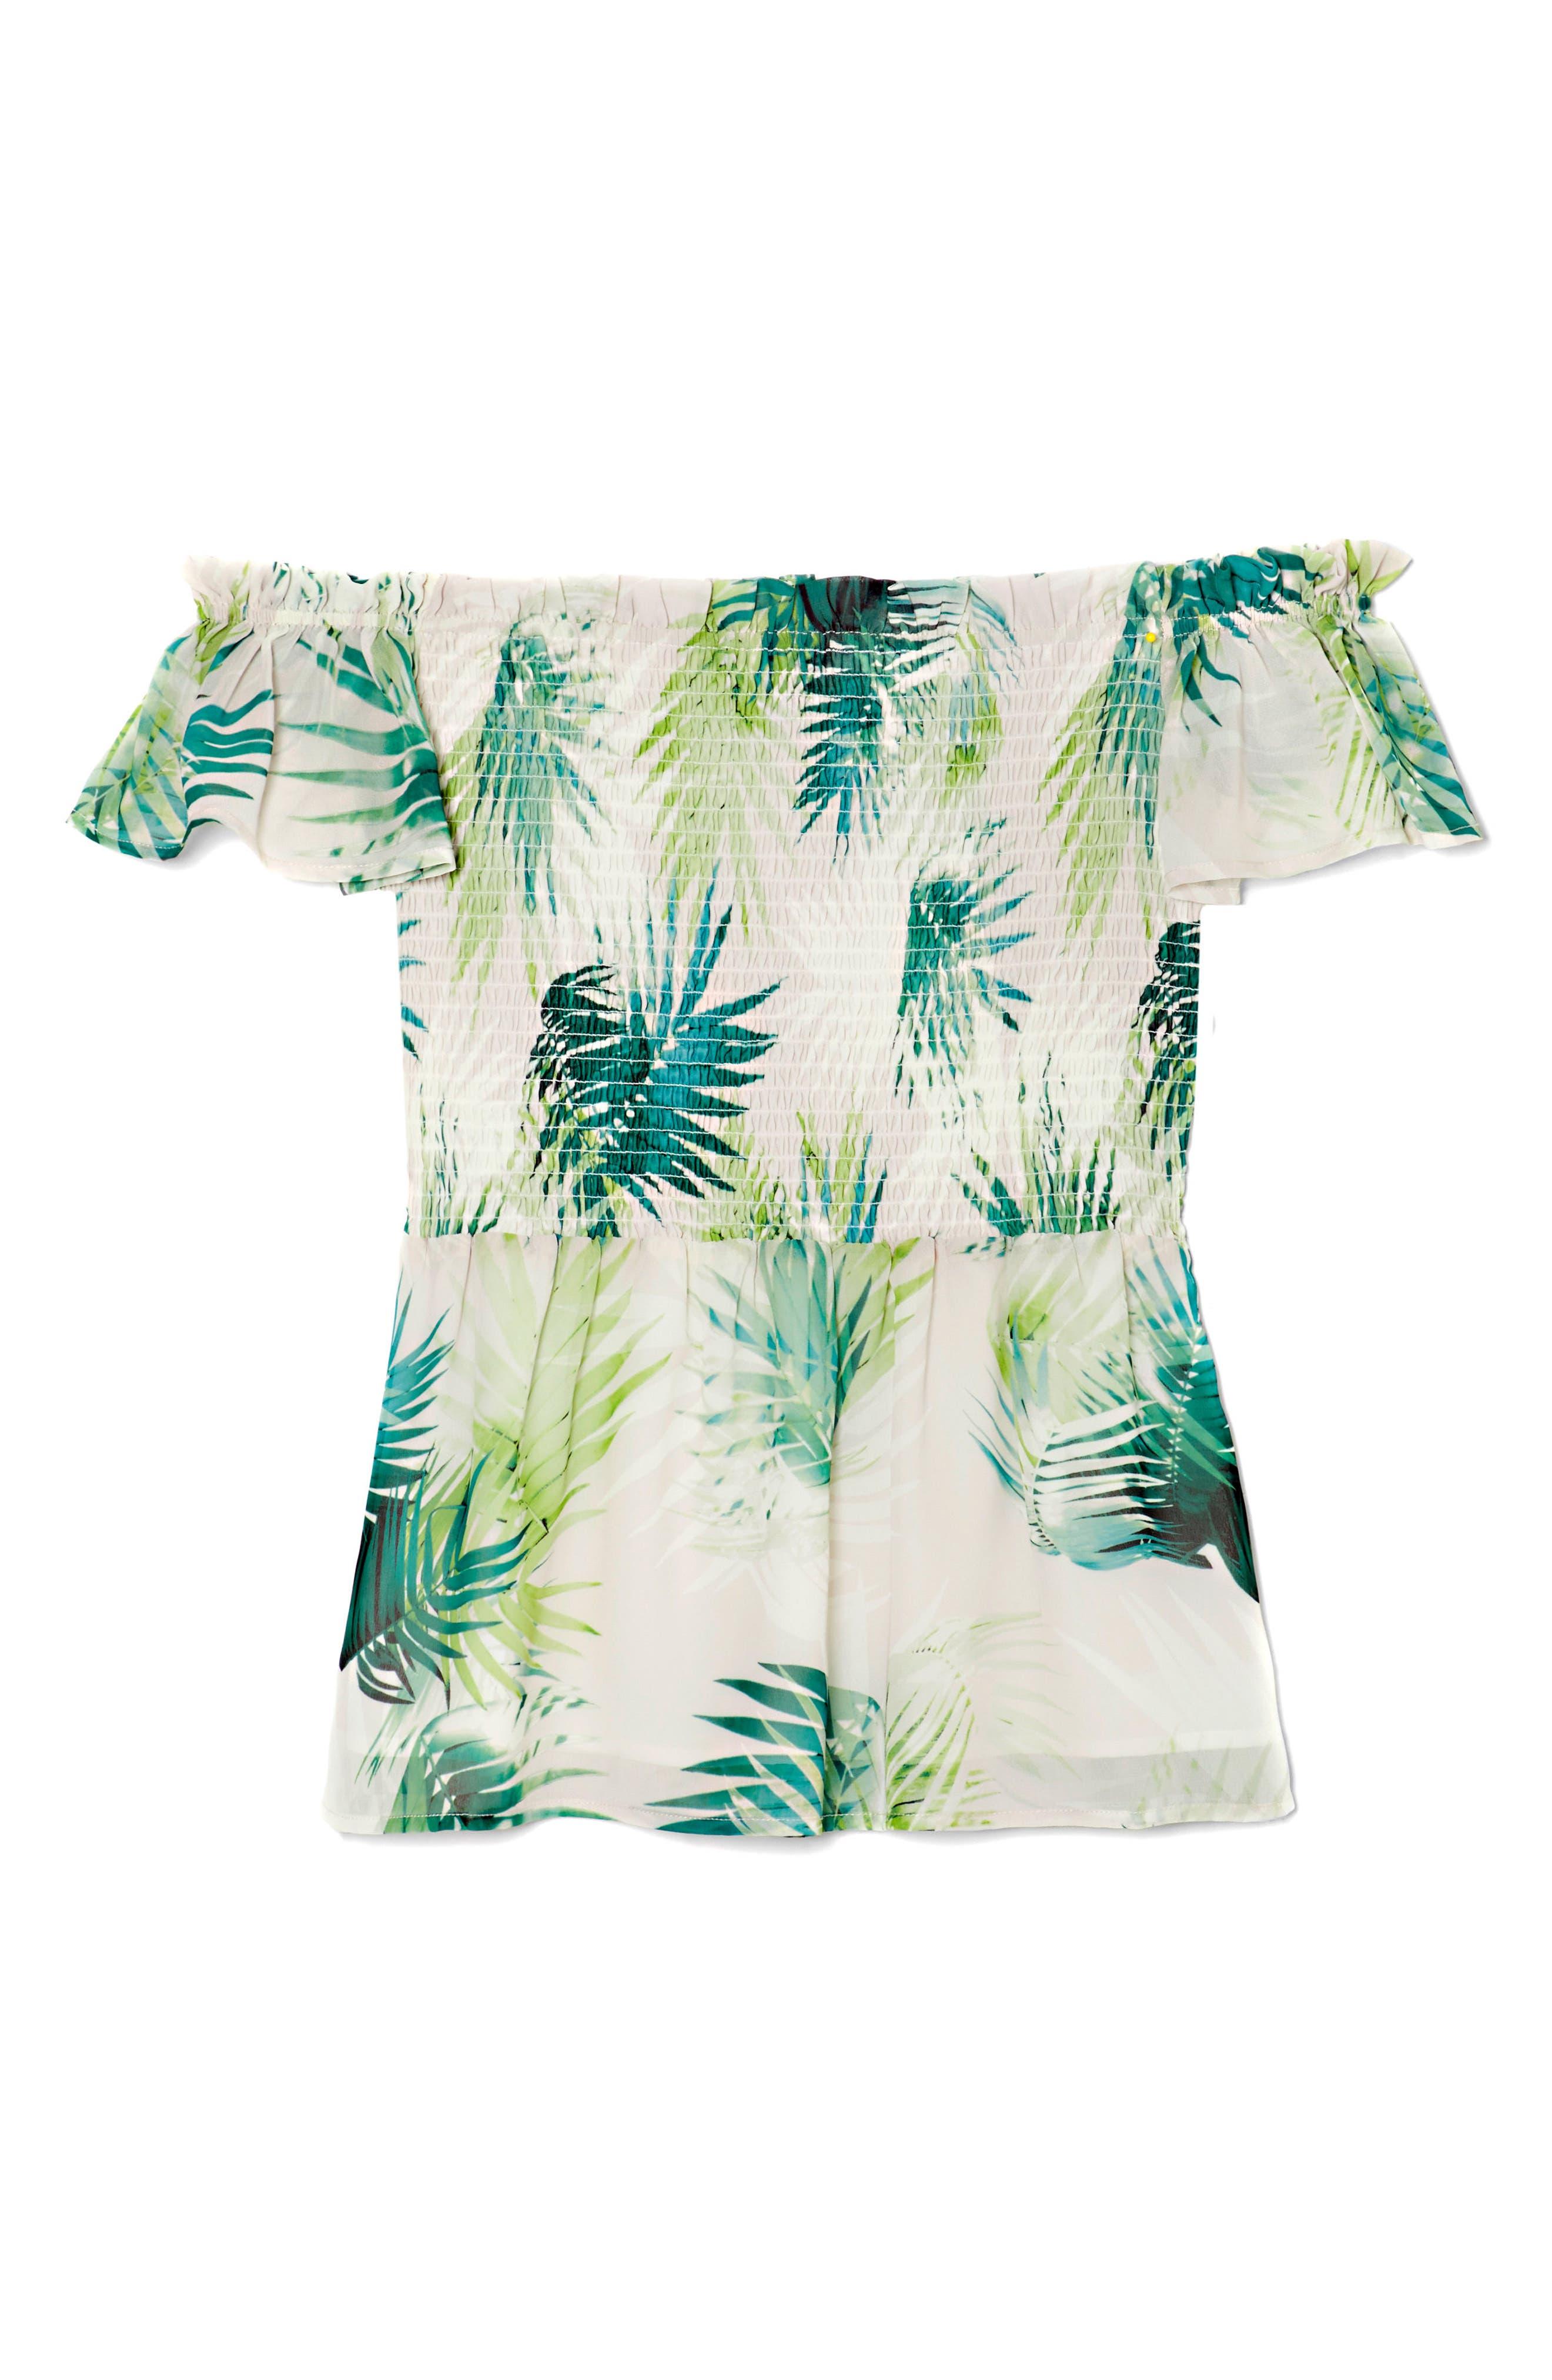 Sunlit Palm Off The Shoulder Top,                             Alternate thumbnail 3, color,                             Verdant Green